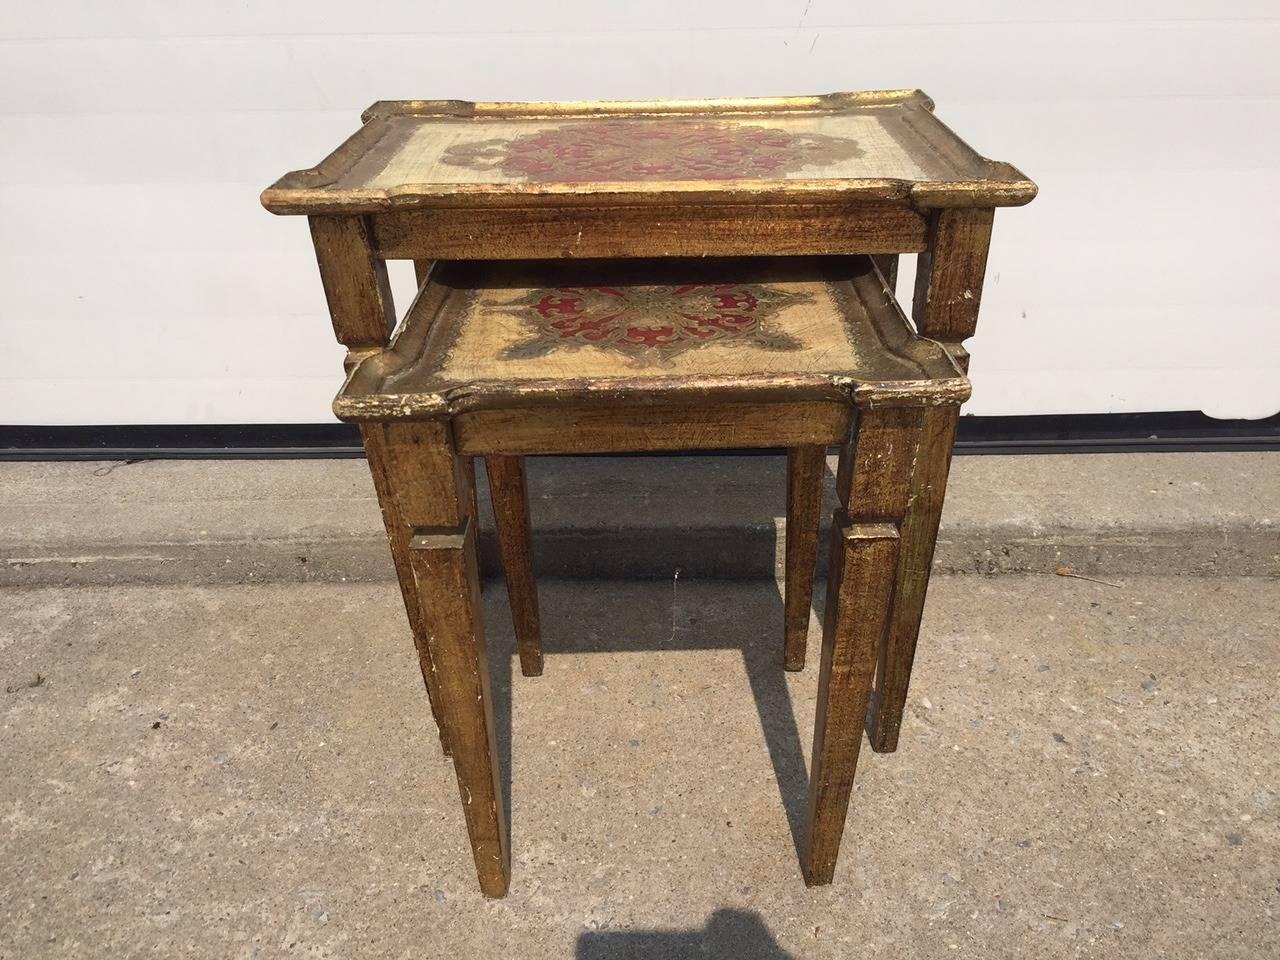 Early 1900s Italian Gilt Nesting Tables, Polychromed For Sale 2